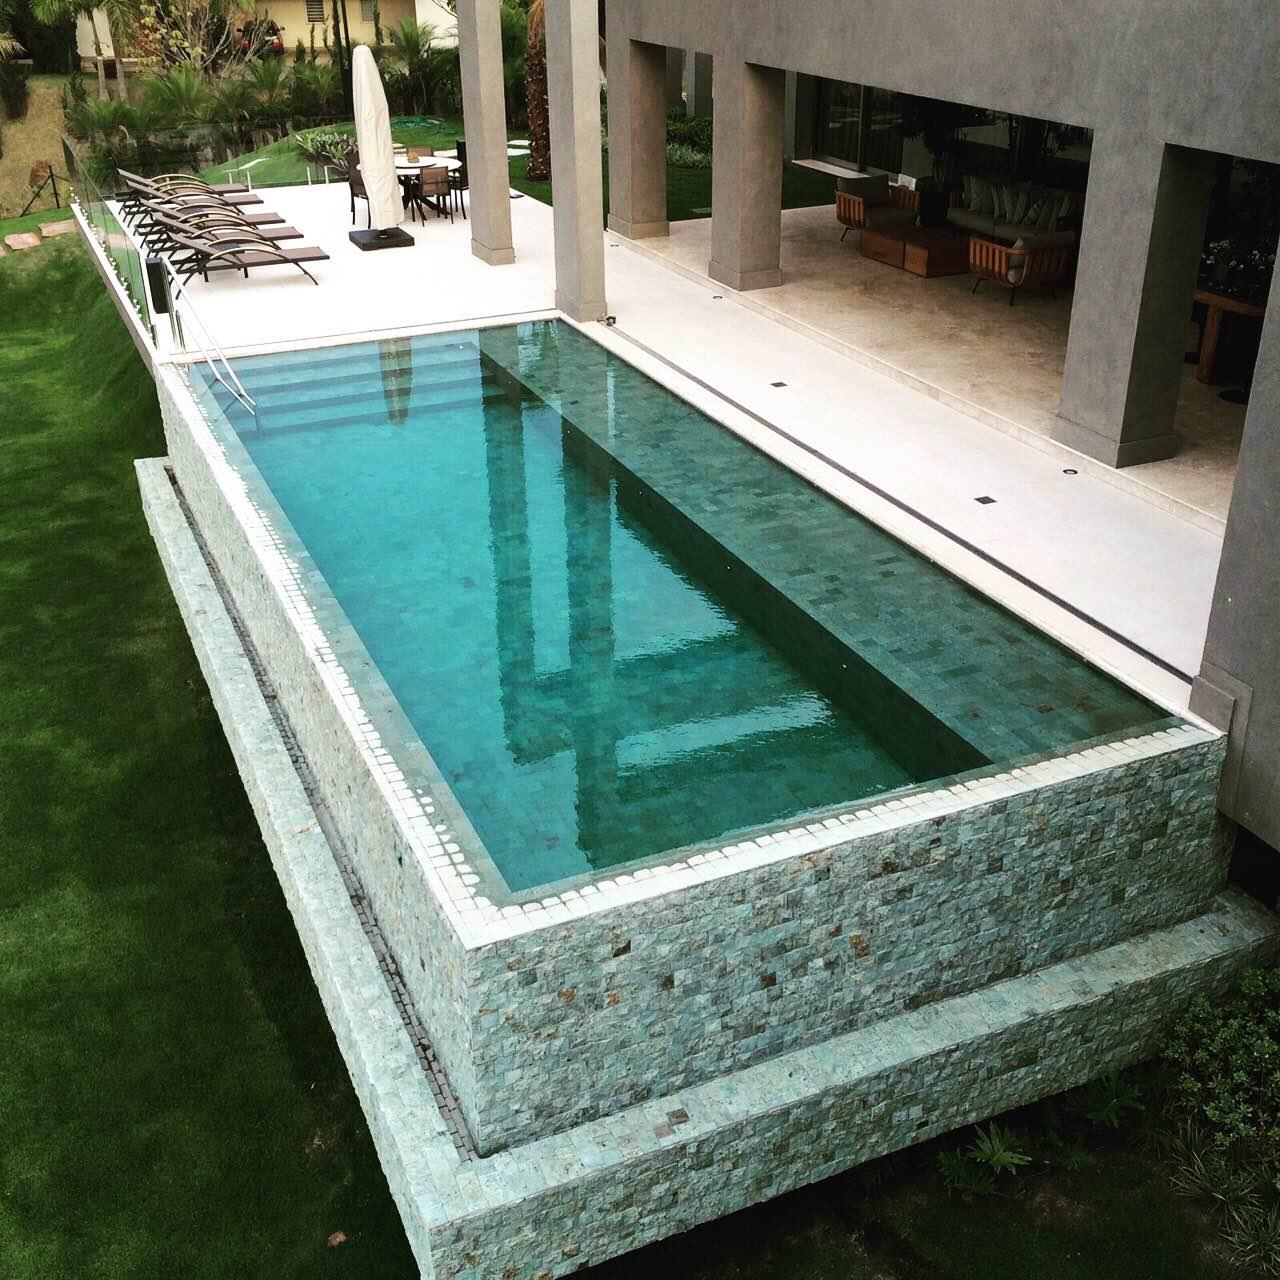 Fiber tudo para piscinas piscinas de alvenaria for Construir piscina concreto